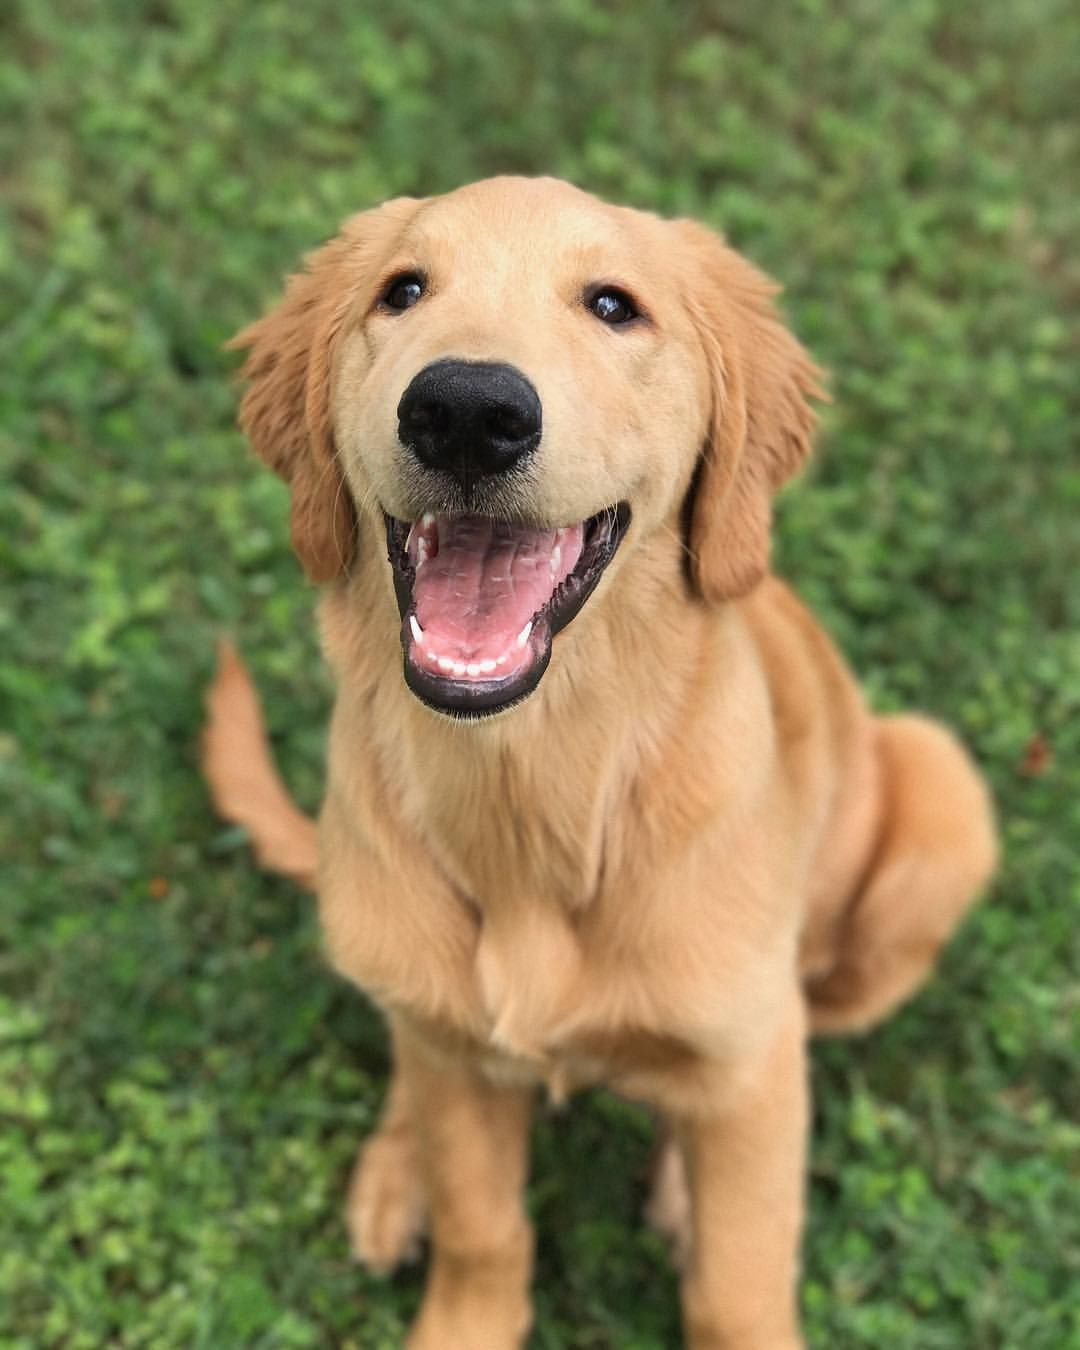 Hurley The Golden Retriever Golden Retriever Golden Retriever Puppy